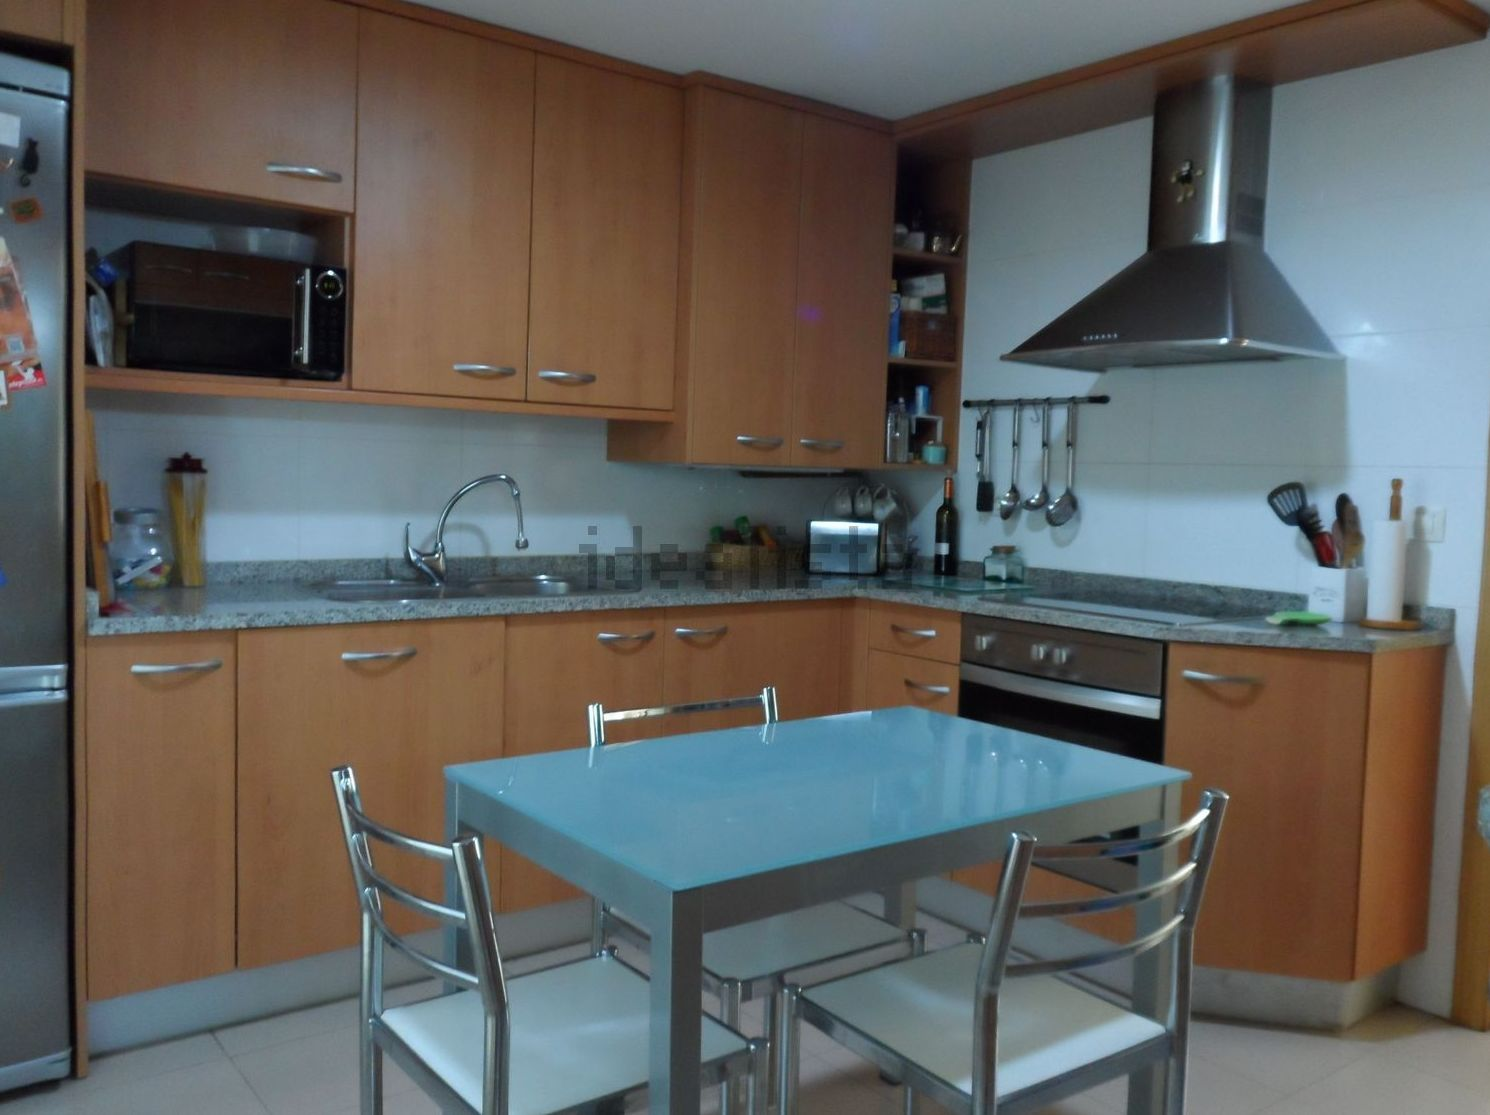 Adosado en venta en Zaragoza zona Montecanal